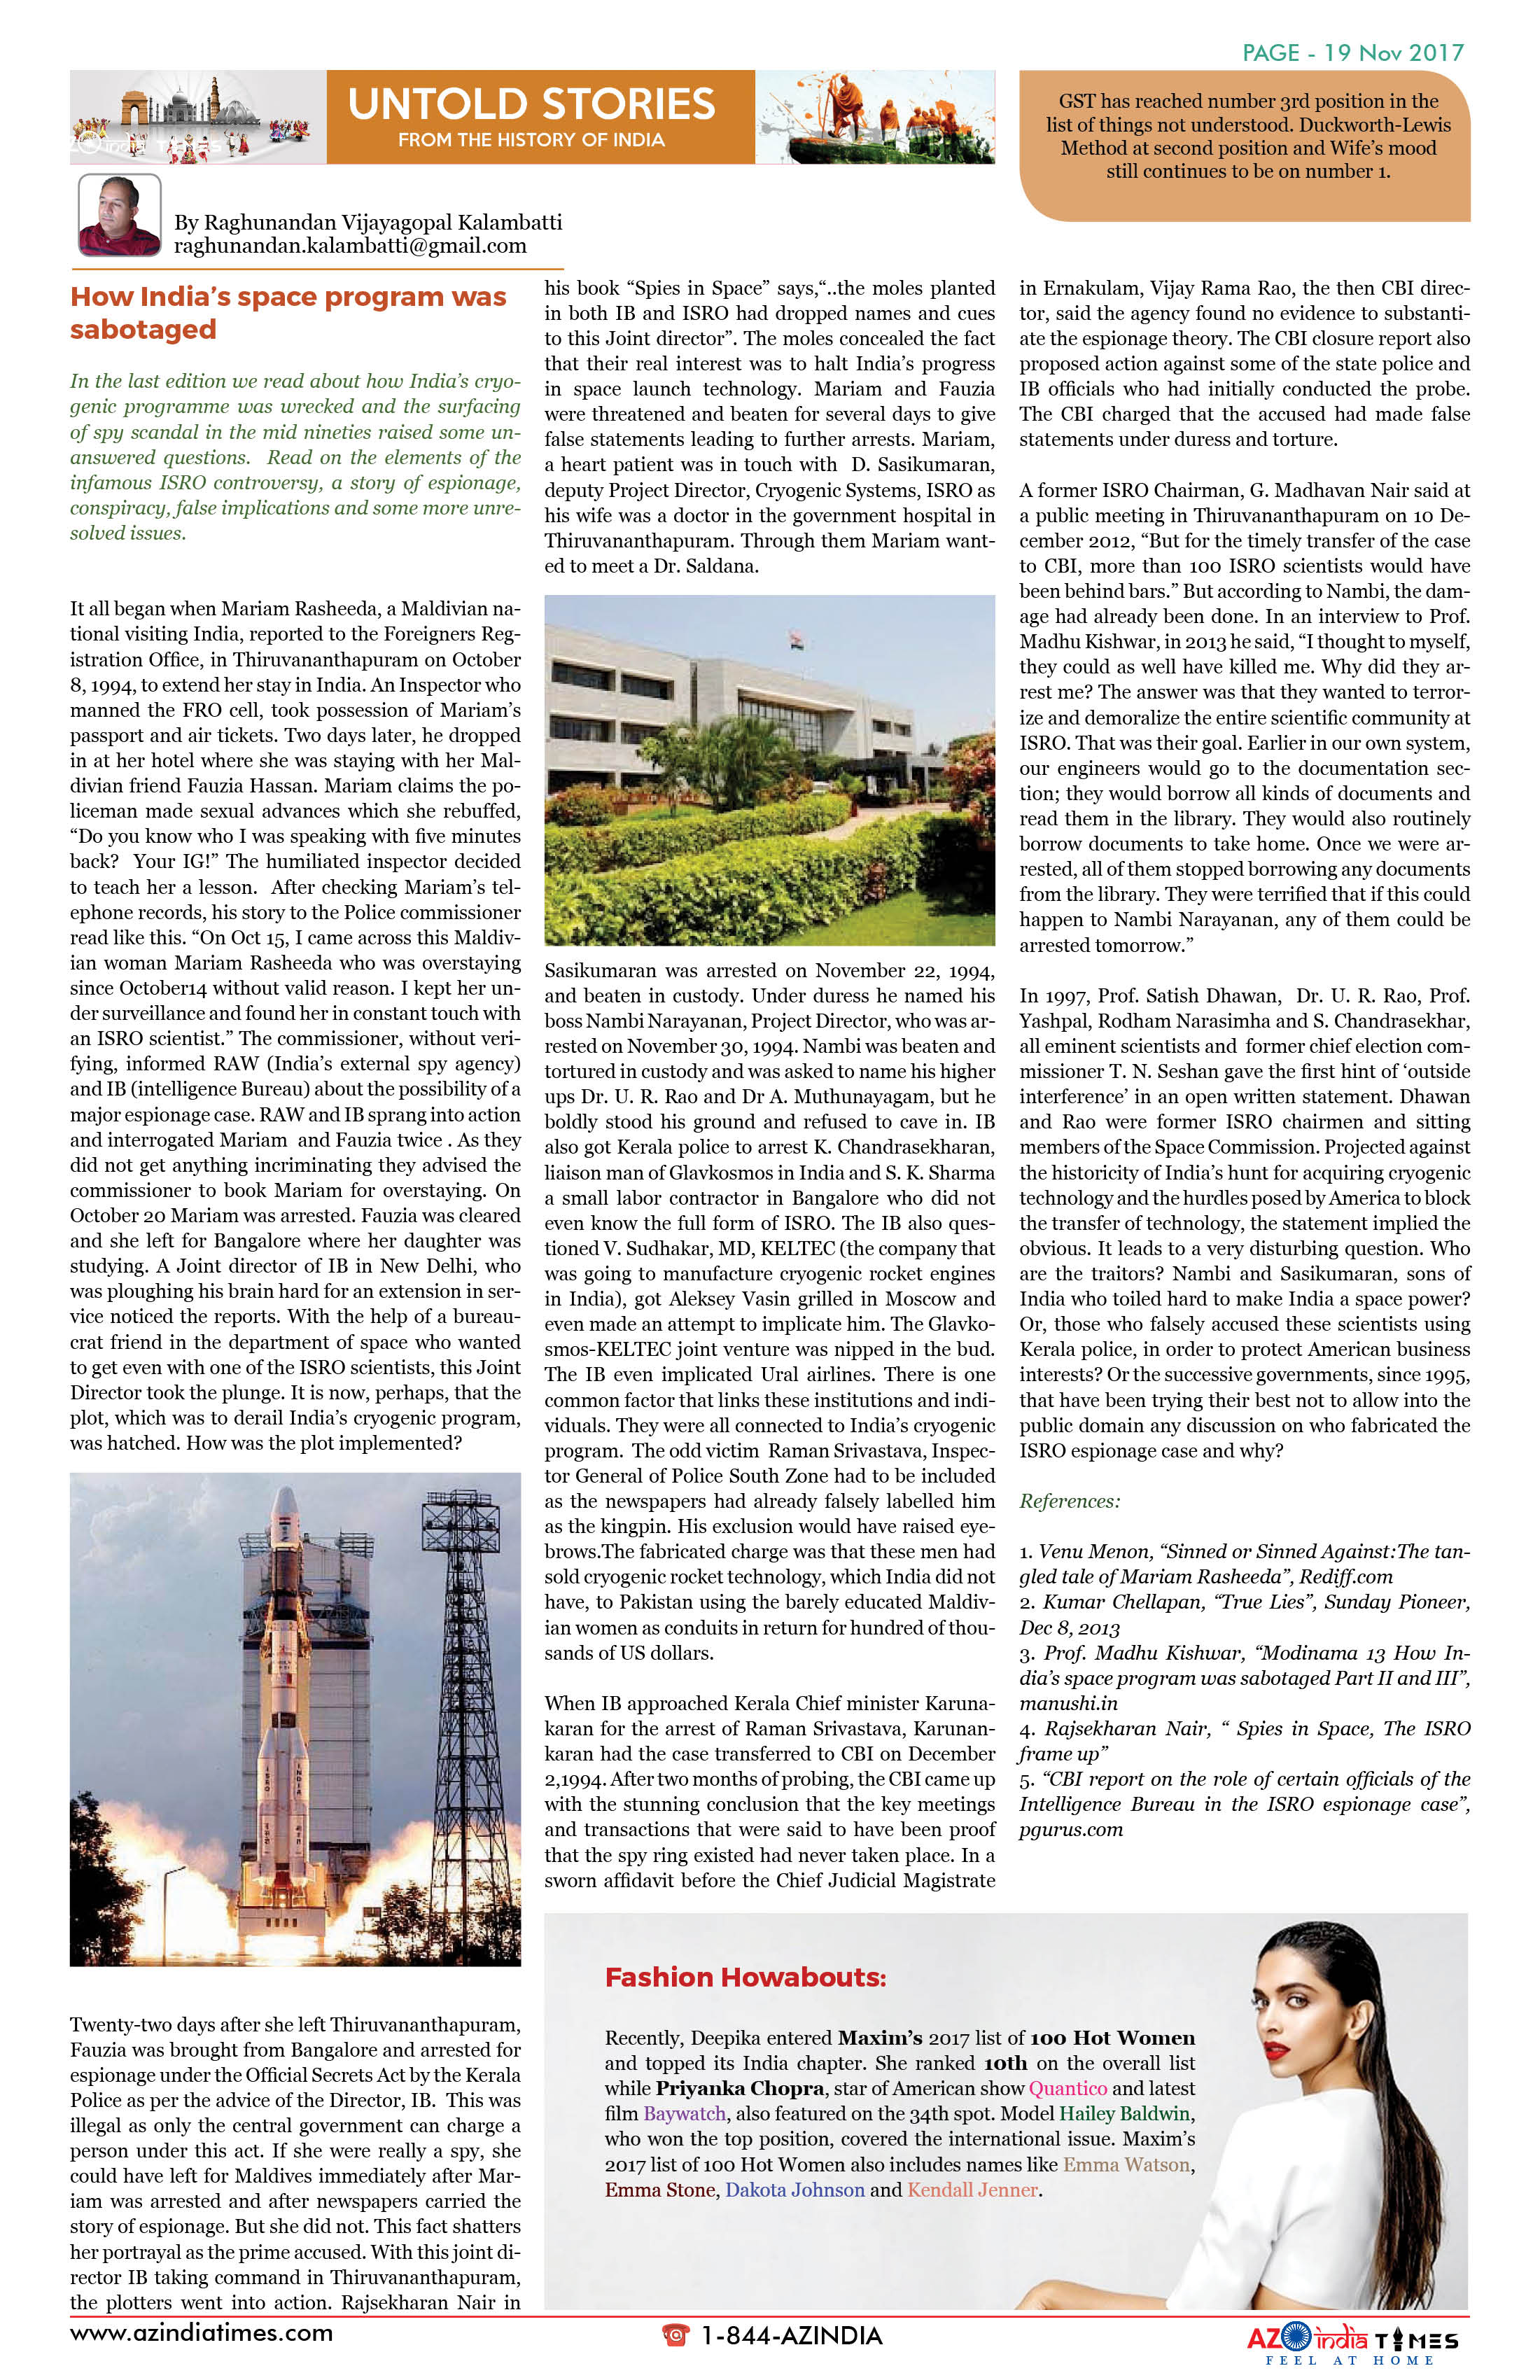 AZ INDIA TIMES NOVEMBER EDITION19